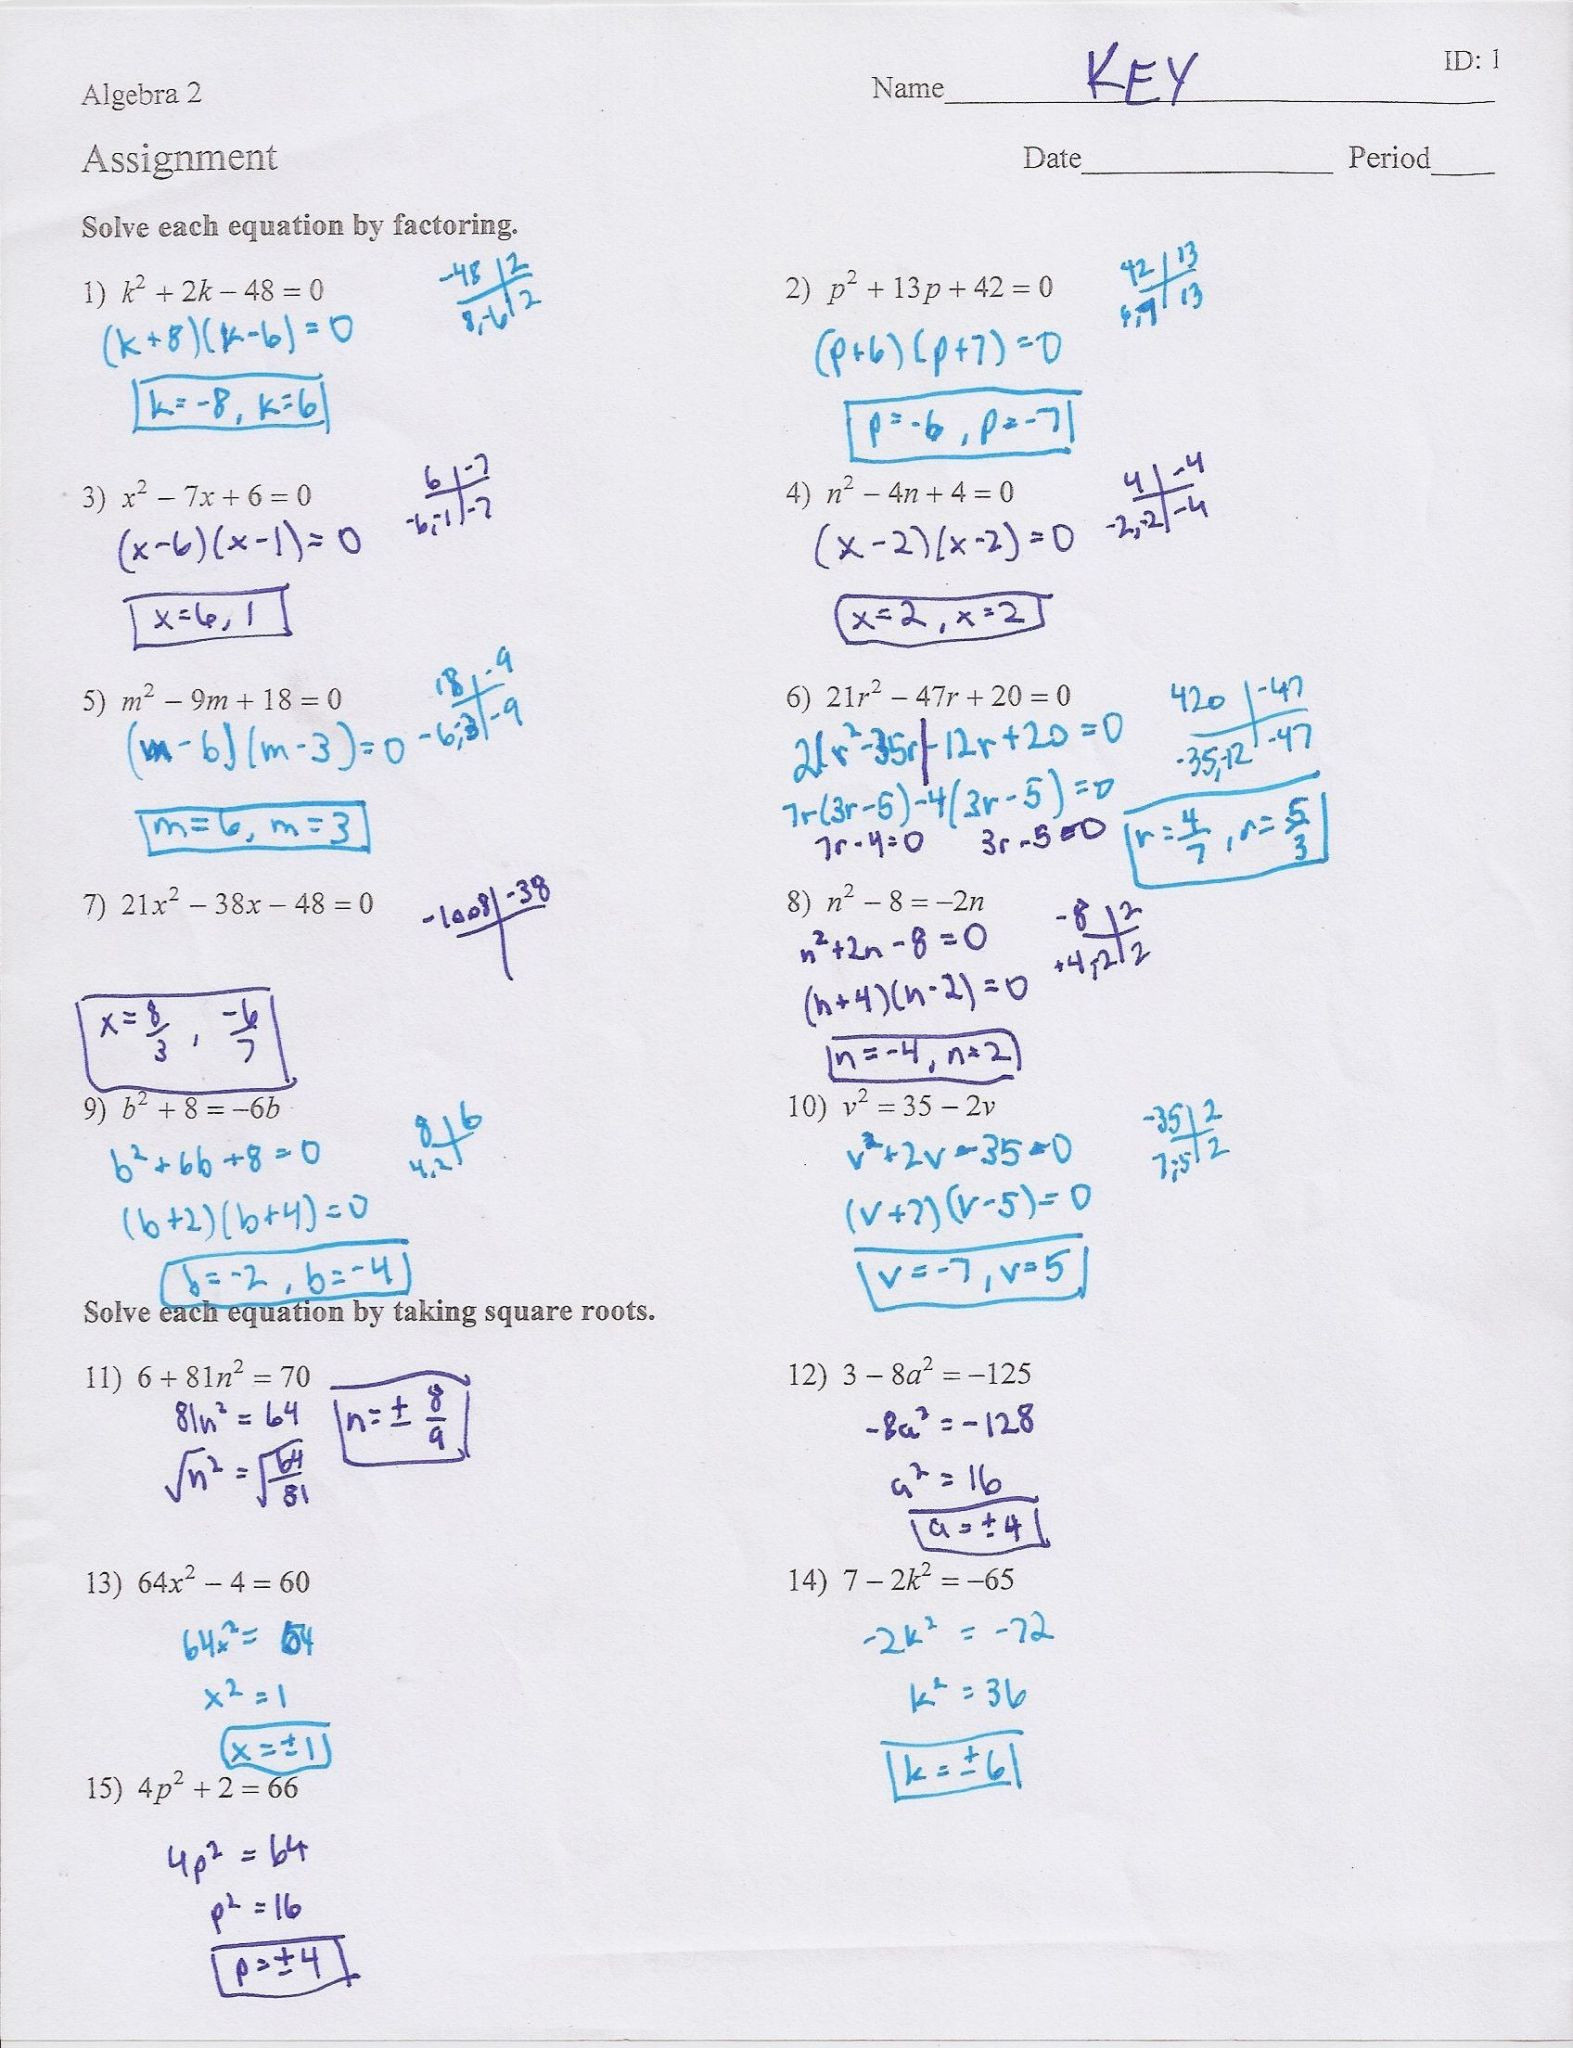 Factoring Trinomials Worksheet Algebra 2 Quadratic formula Worksheets Printable